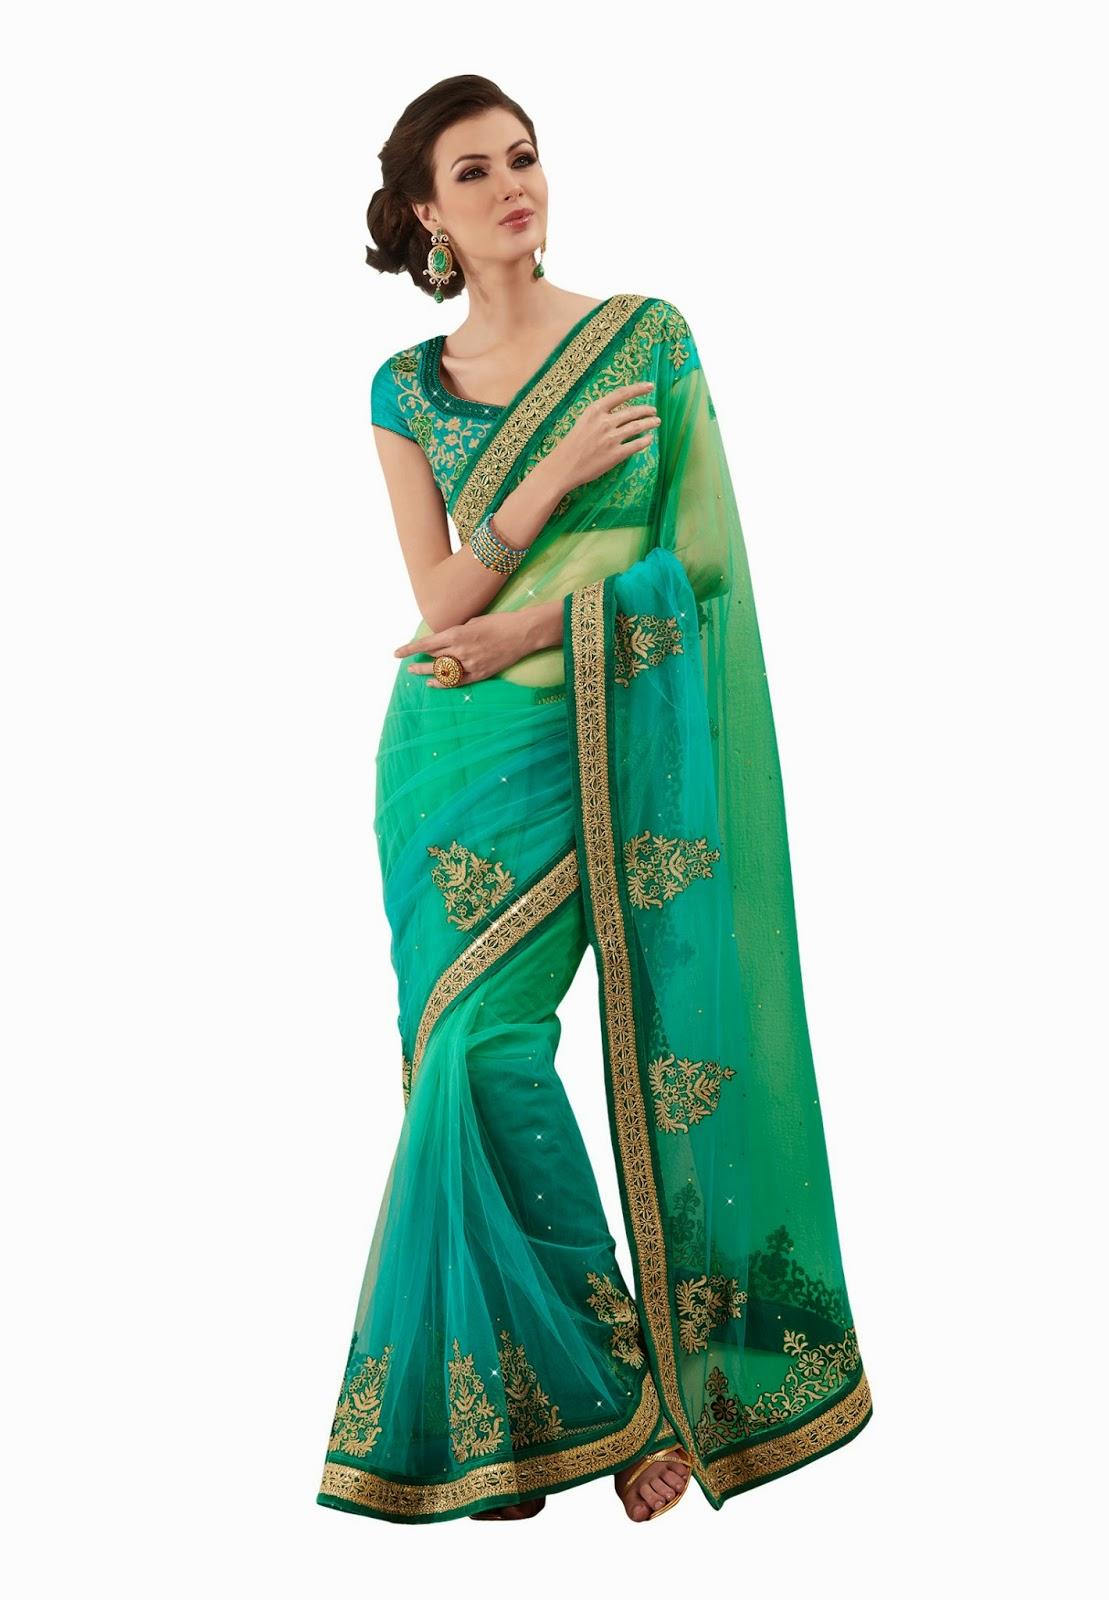 Designer sarees online anarkali suits online indian kurtis - Online shopping usa ...